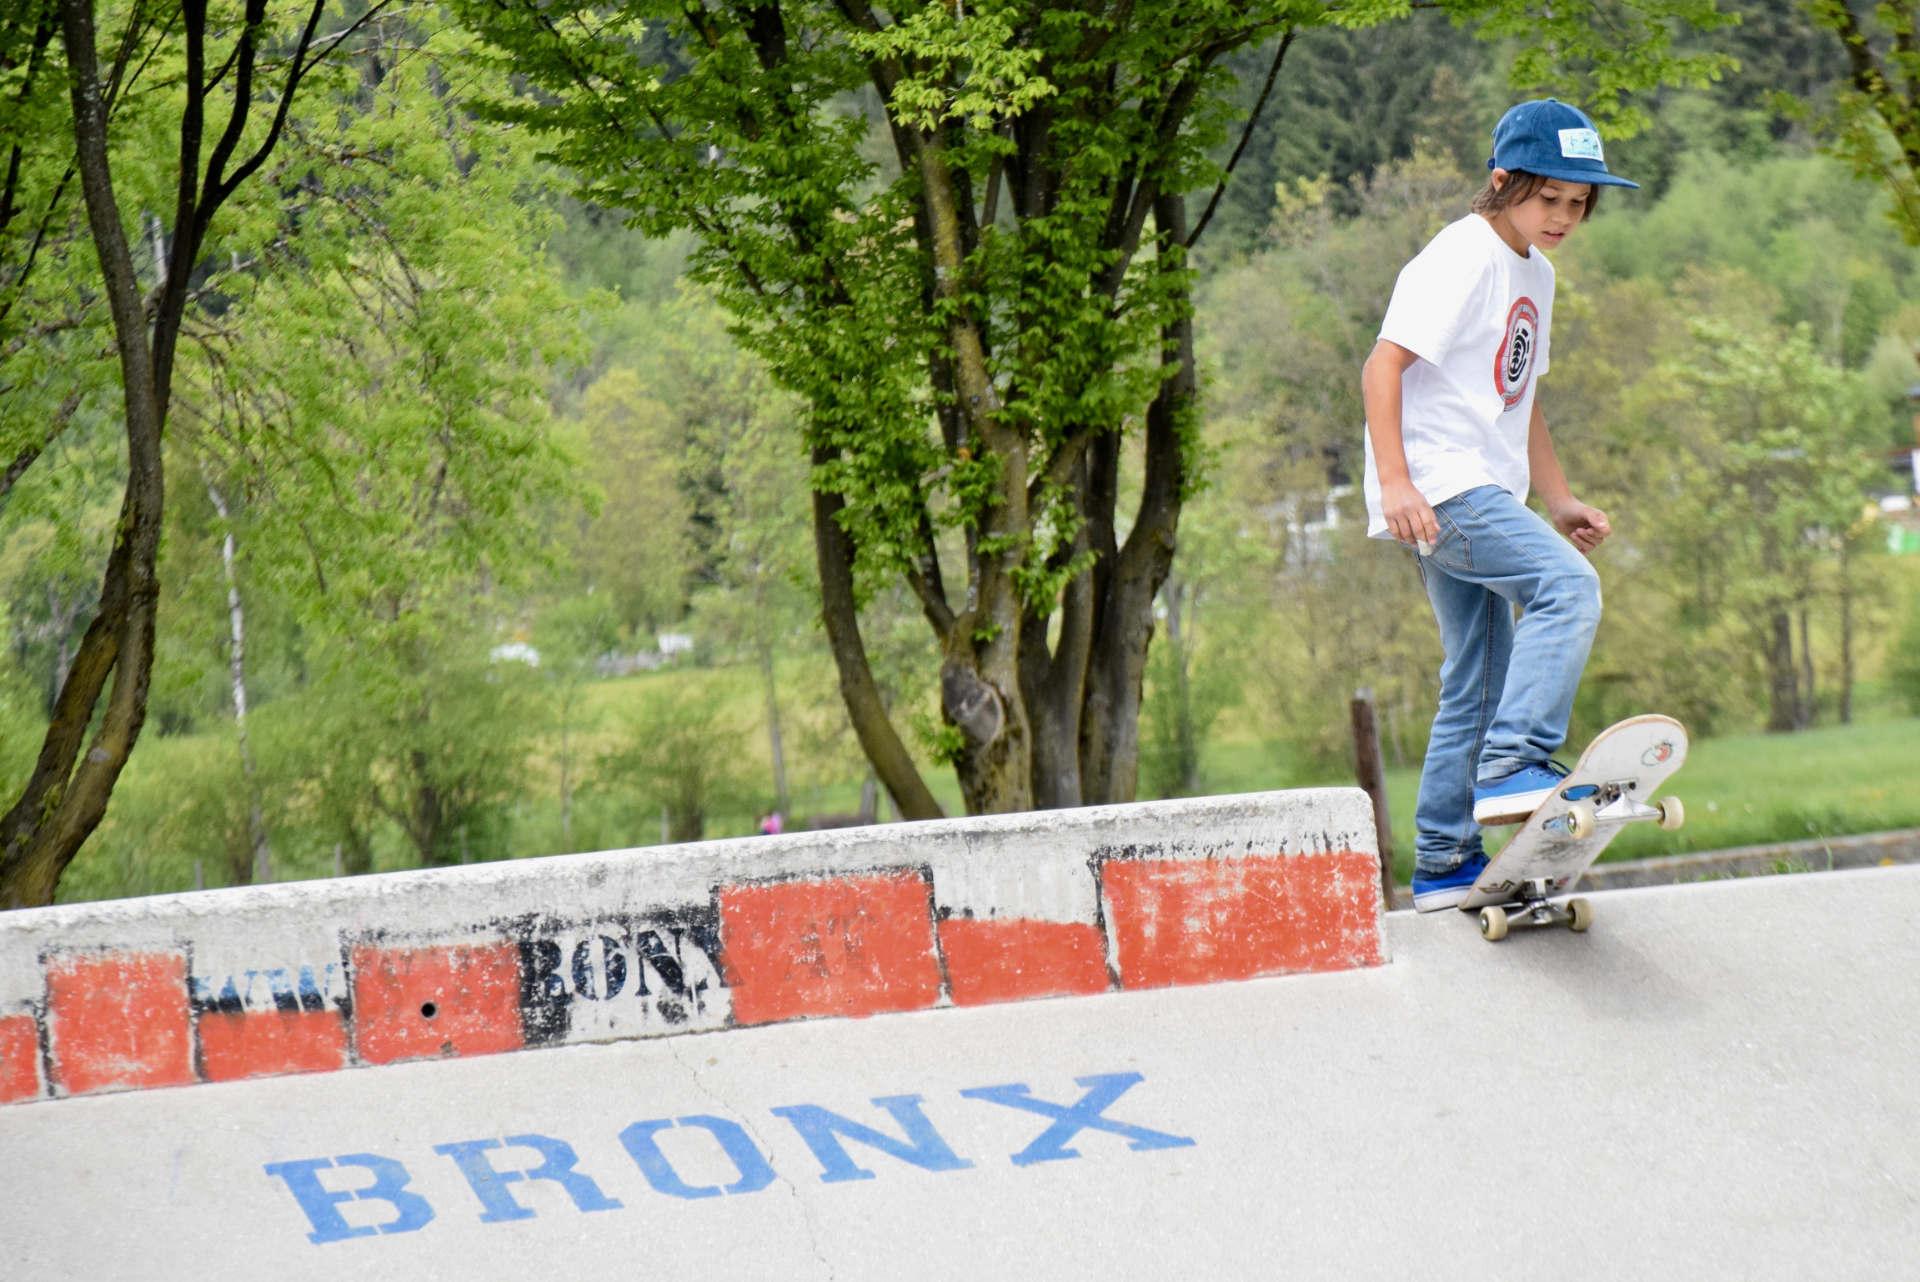 skateboard headz fieberbrunn kgt kitz gau trophy 2019 saalfelden00010